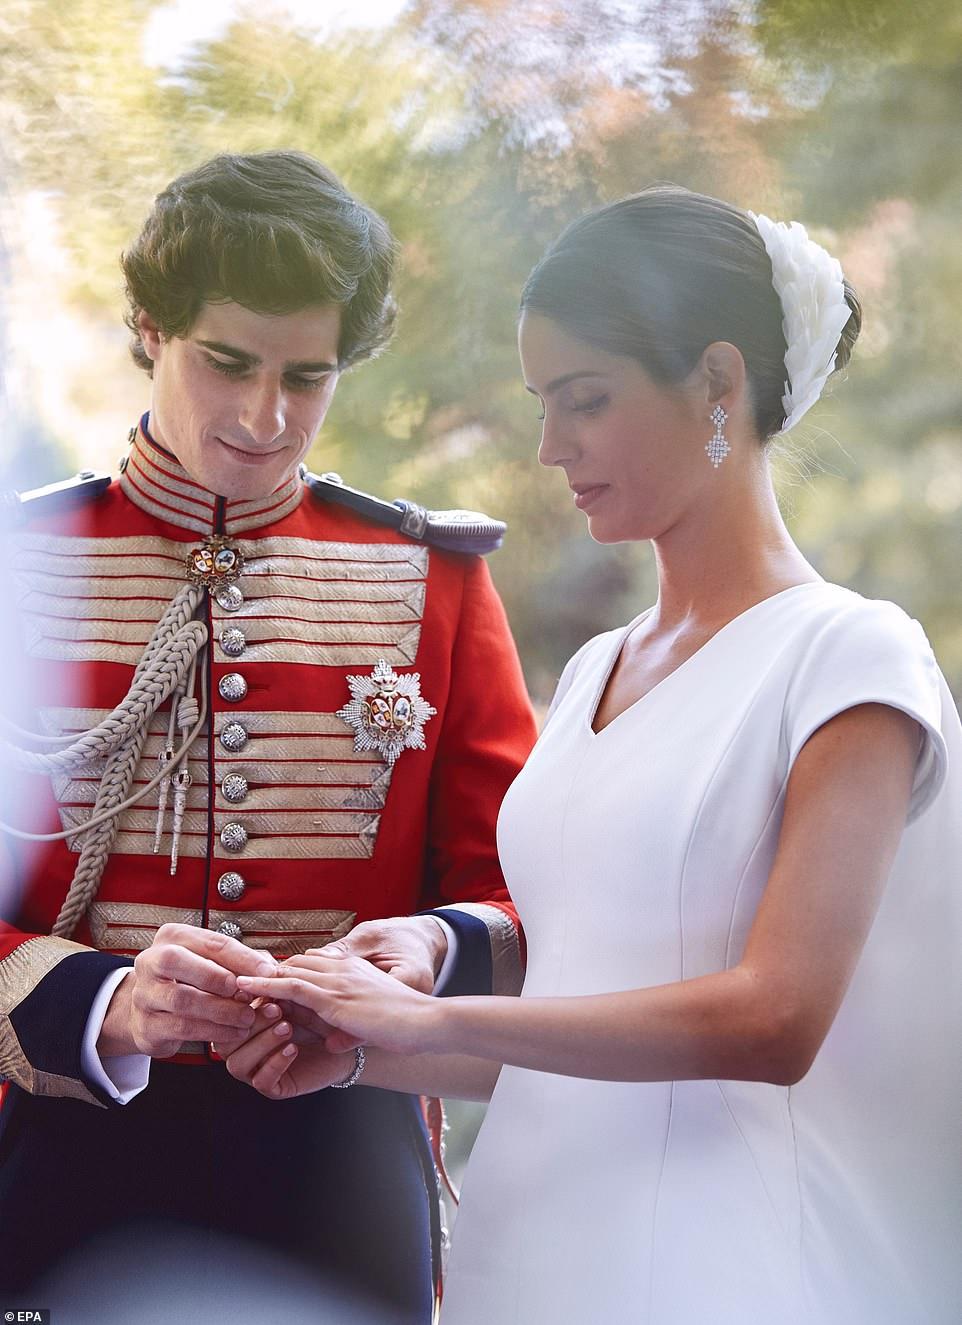 4879916-6255699-The_Duke_of_Huescar_married_his_pride_Sofia_Palazuelo_at_a_lavis-a-53_1539077513902